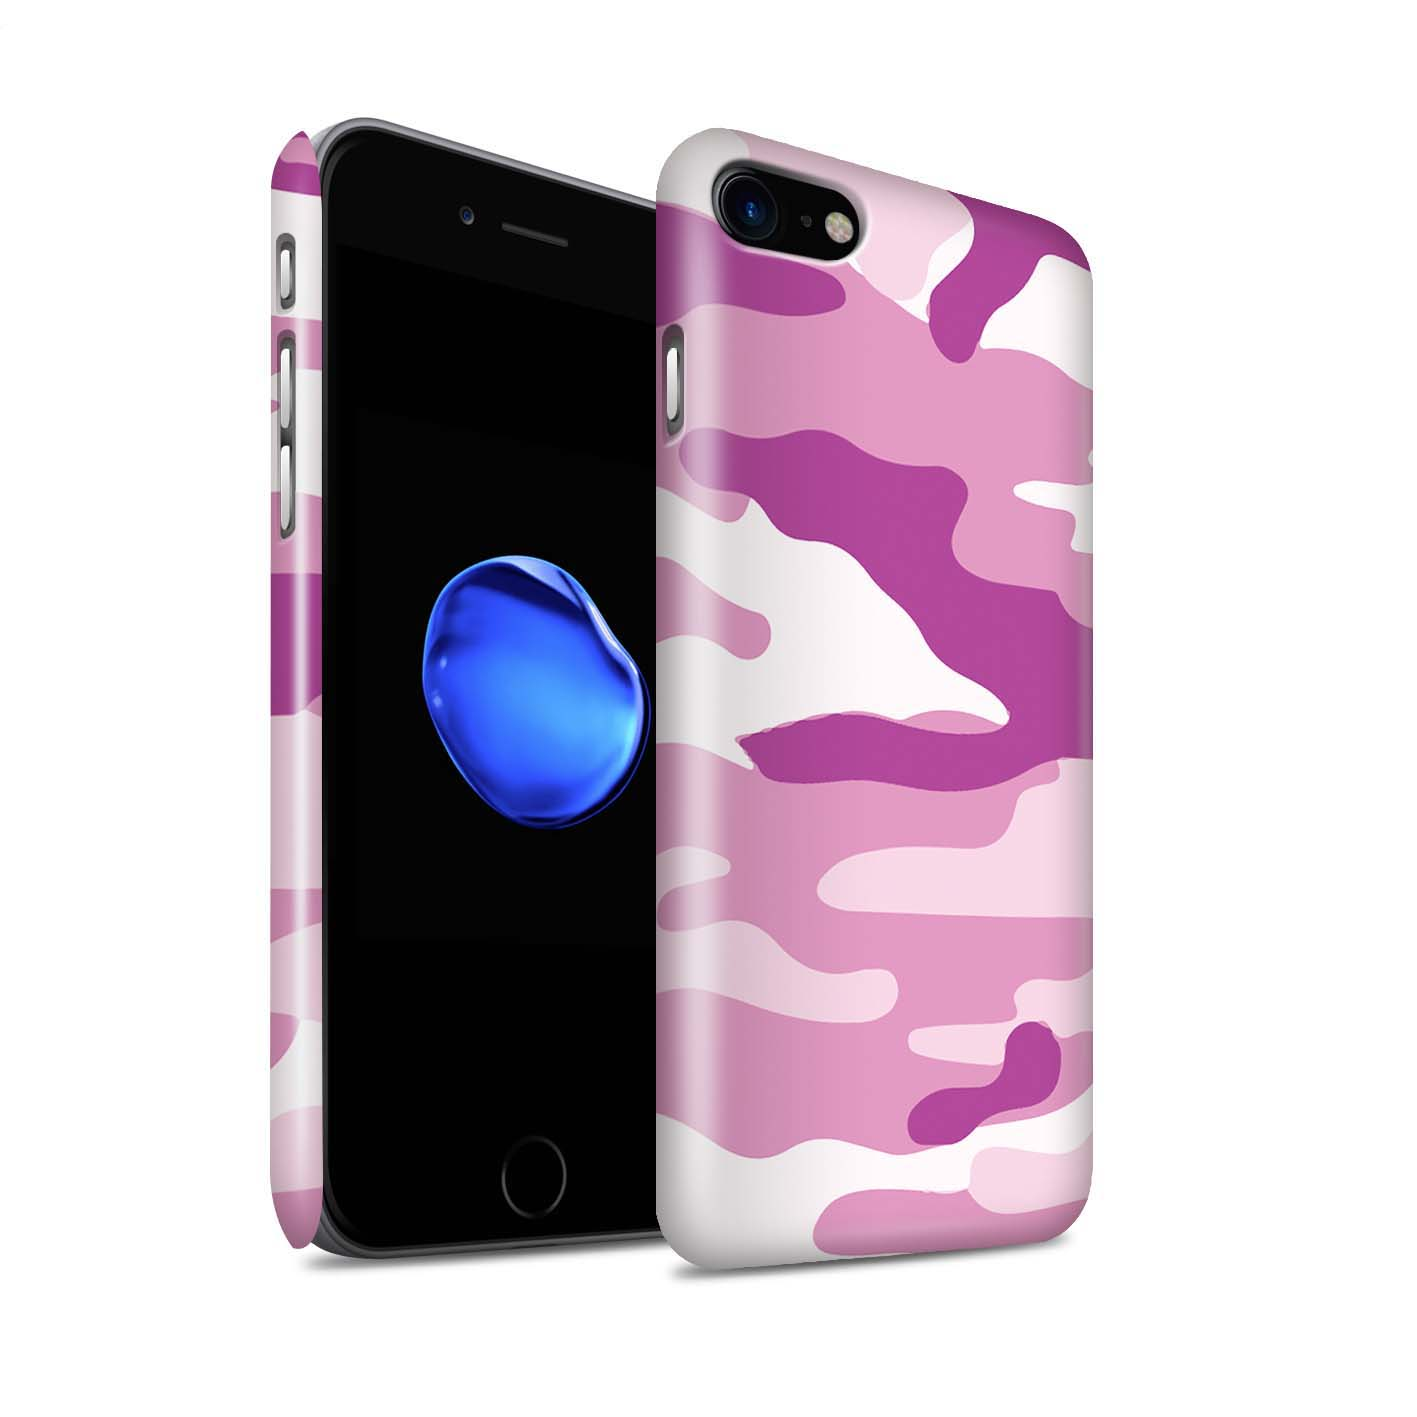 Coque-Etui-Brillant-de-STUFF4-pour-Apple-iPhone-7-Armee-Camouflage